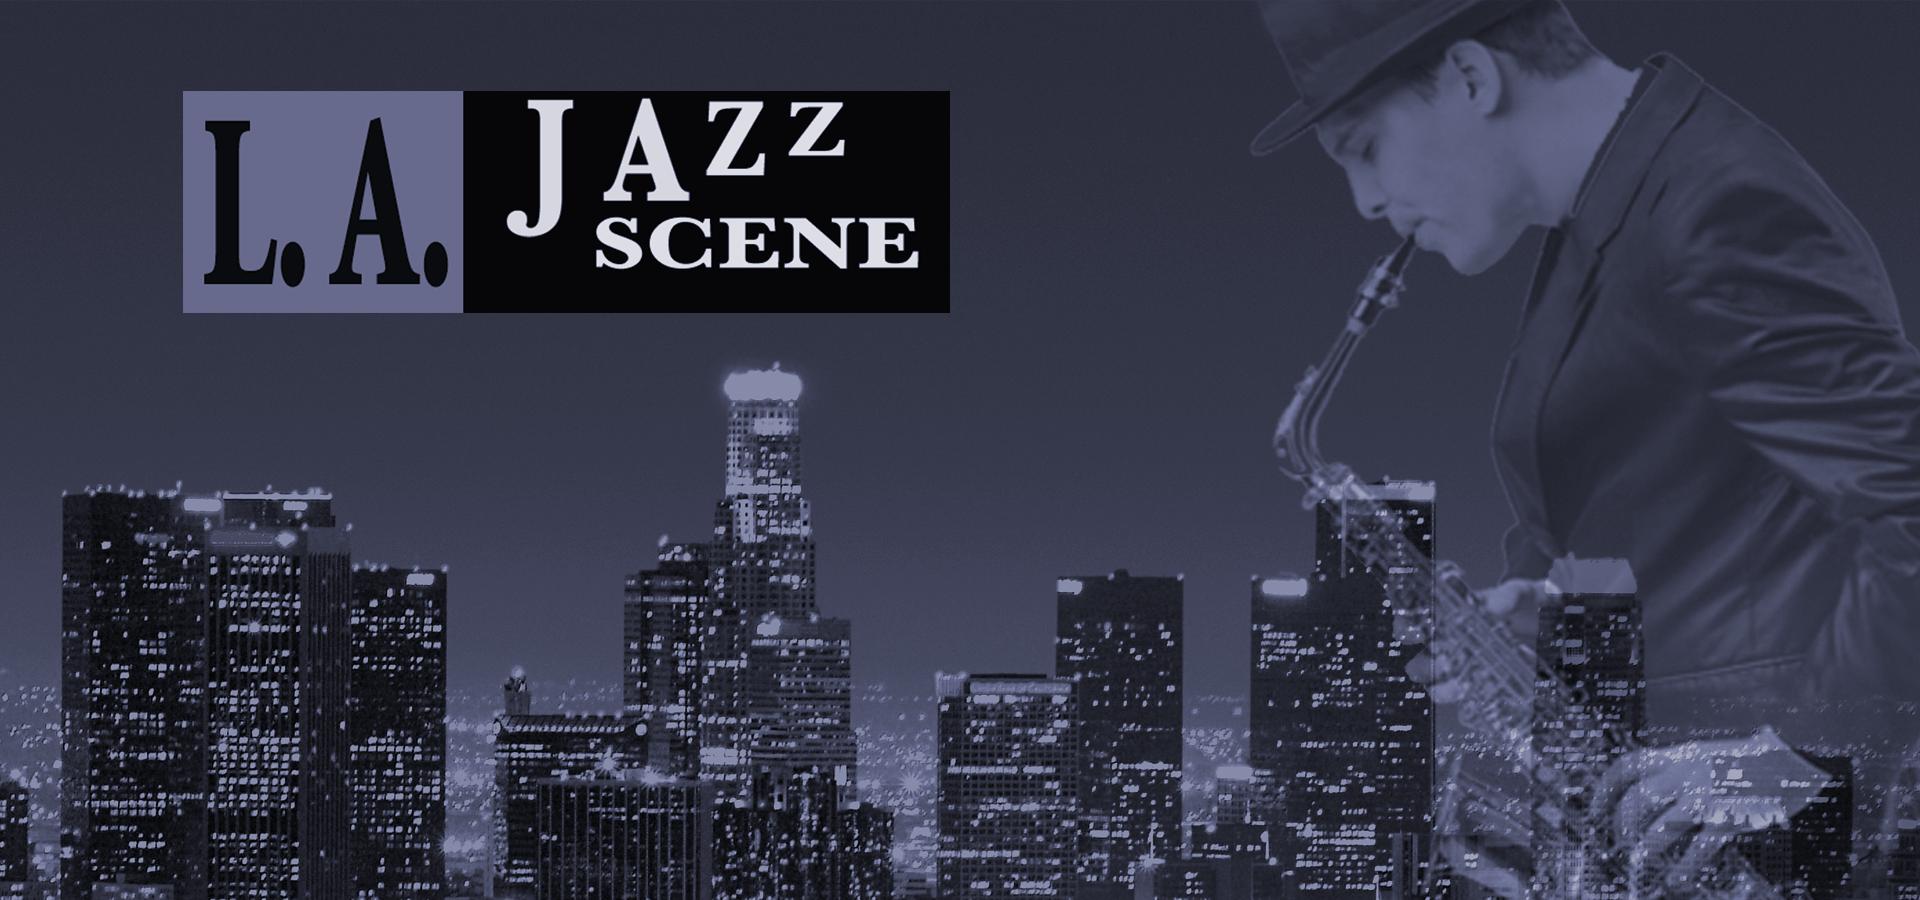 L.A. Jazz Scene